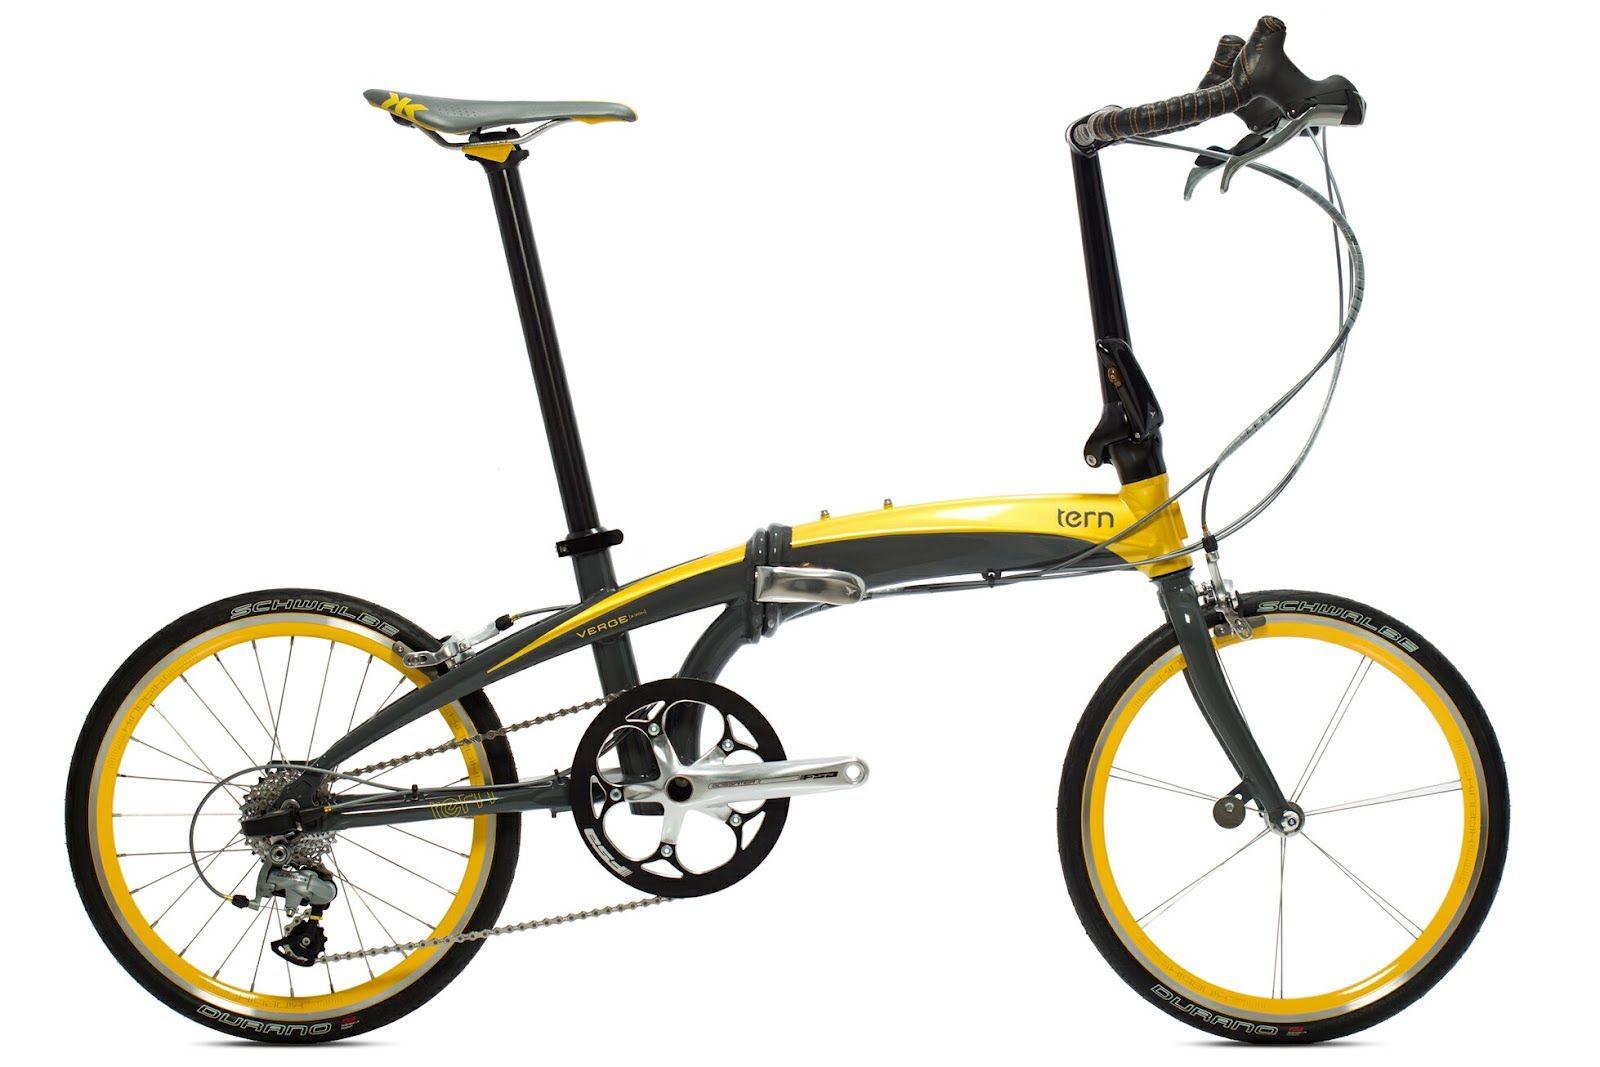 Tern Folding Bike Sepeda Olahraga Tas